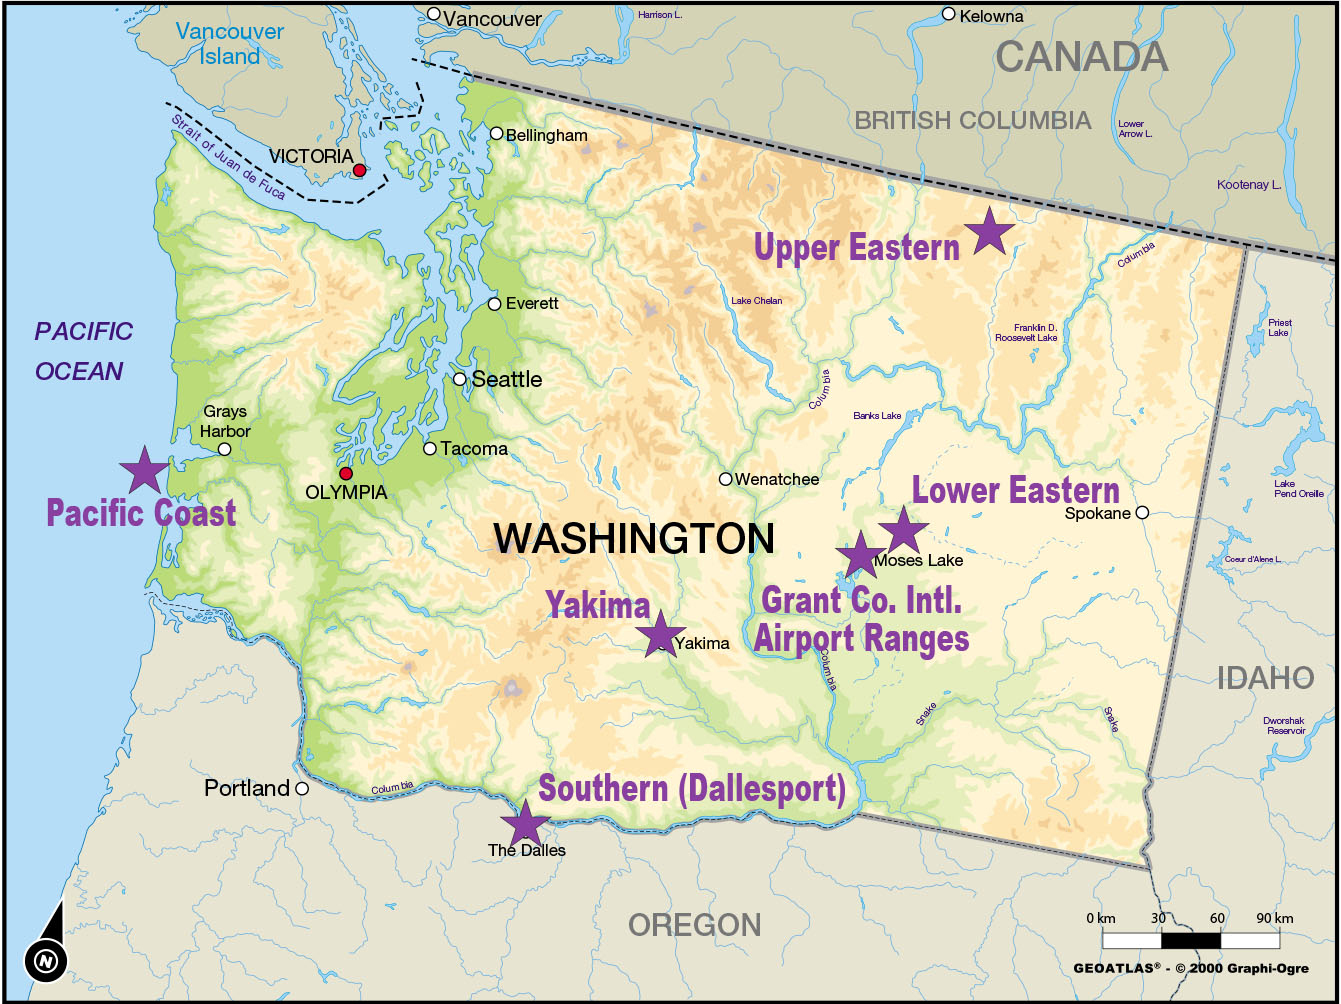 moses lake wa map Unmanned Aircraft System Proposal Takes Flight Business Wire moses lake wa map